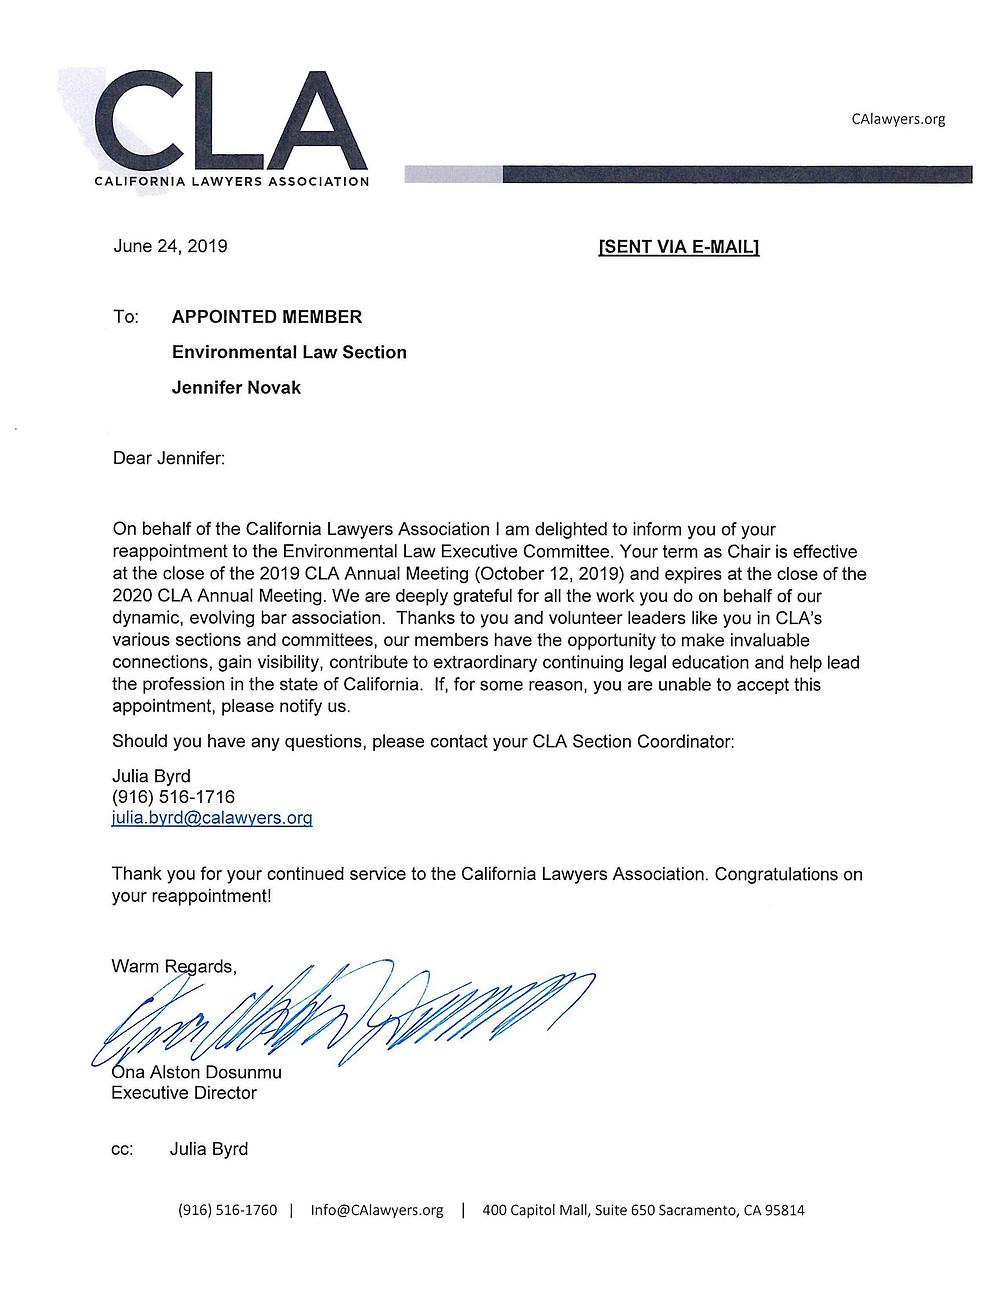 copy of a letter on California Lawyers Association letterhead